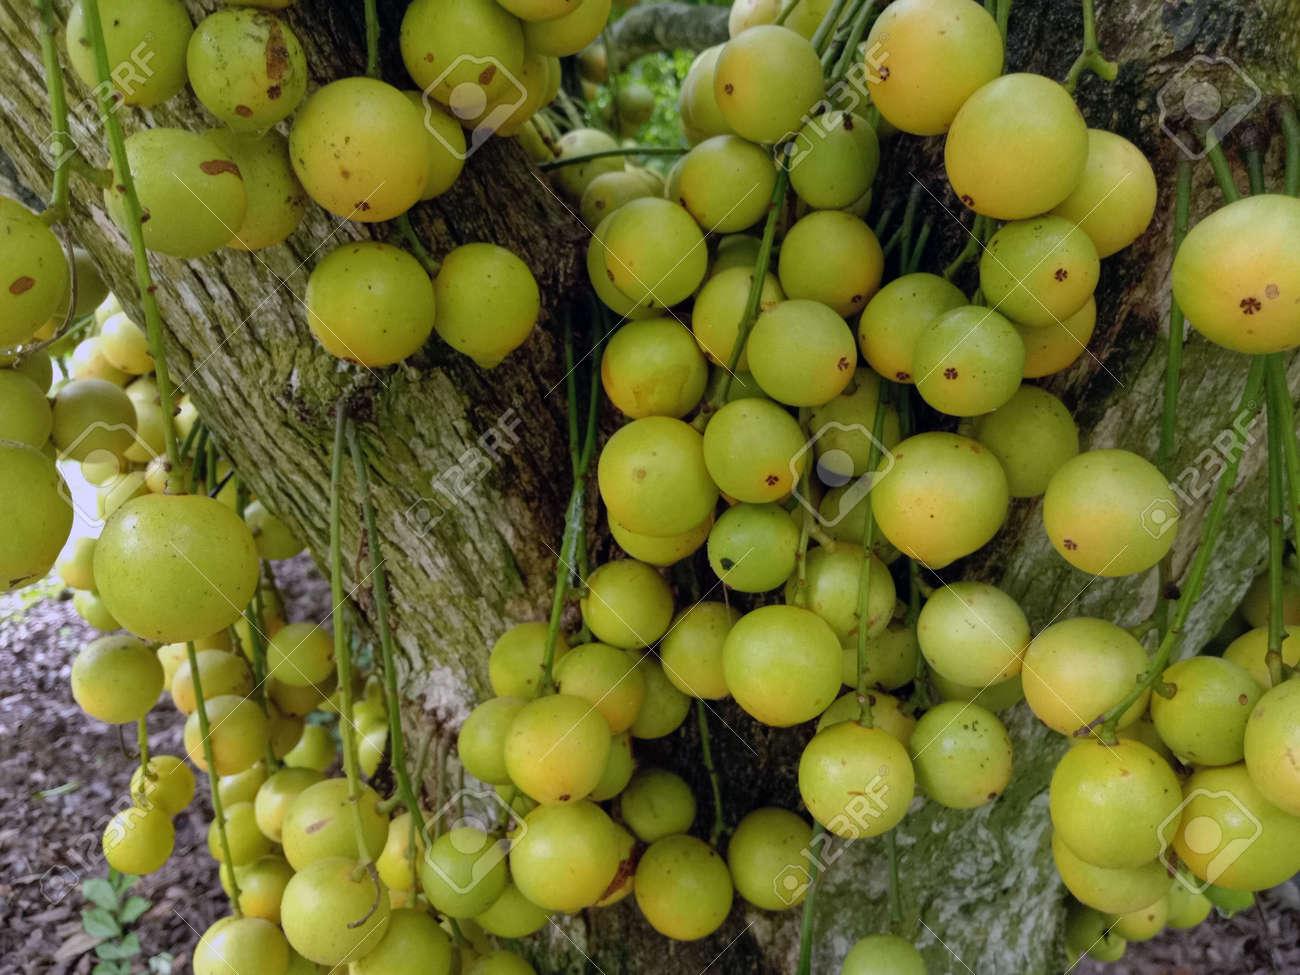 tasty baccaurea motleyana stock on tree in the farm for harvest - 170752290